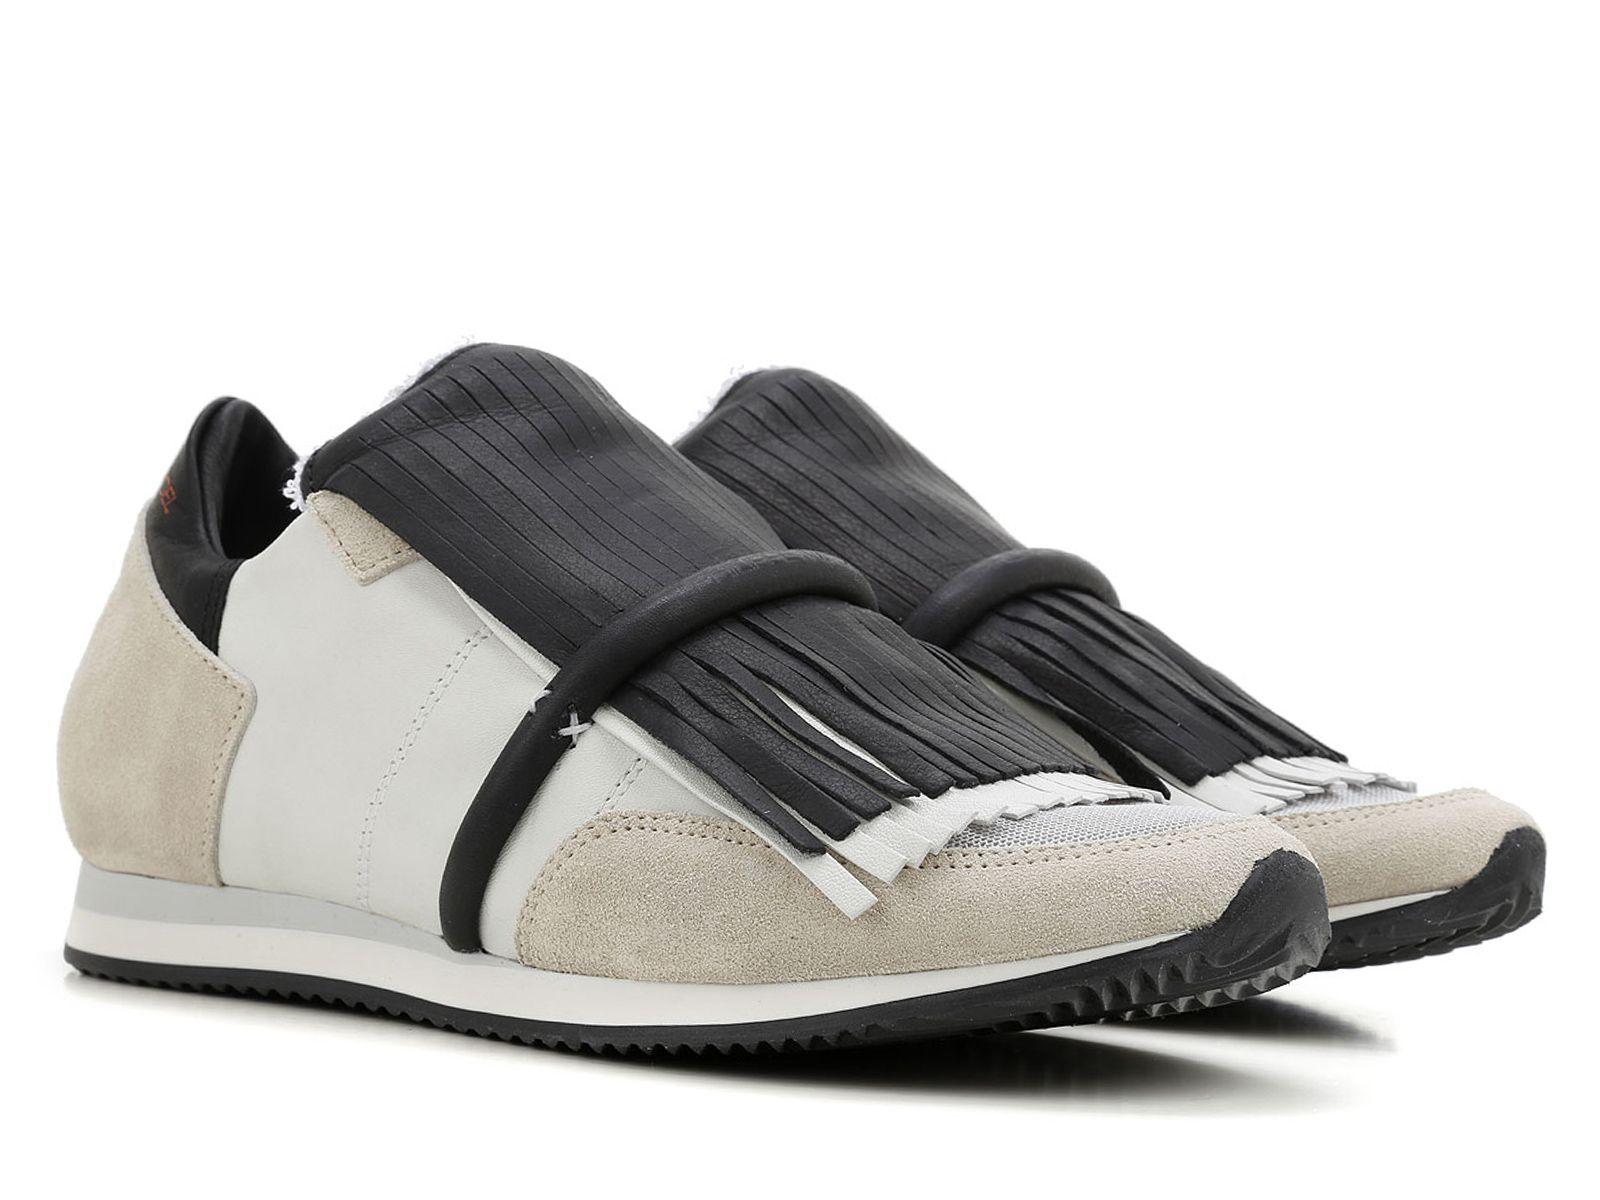 Philippe Model women sneakers in beige Leather and Fabric - Italian  Boutique €176 c10e56ba12e